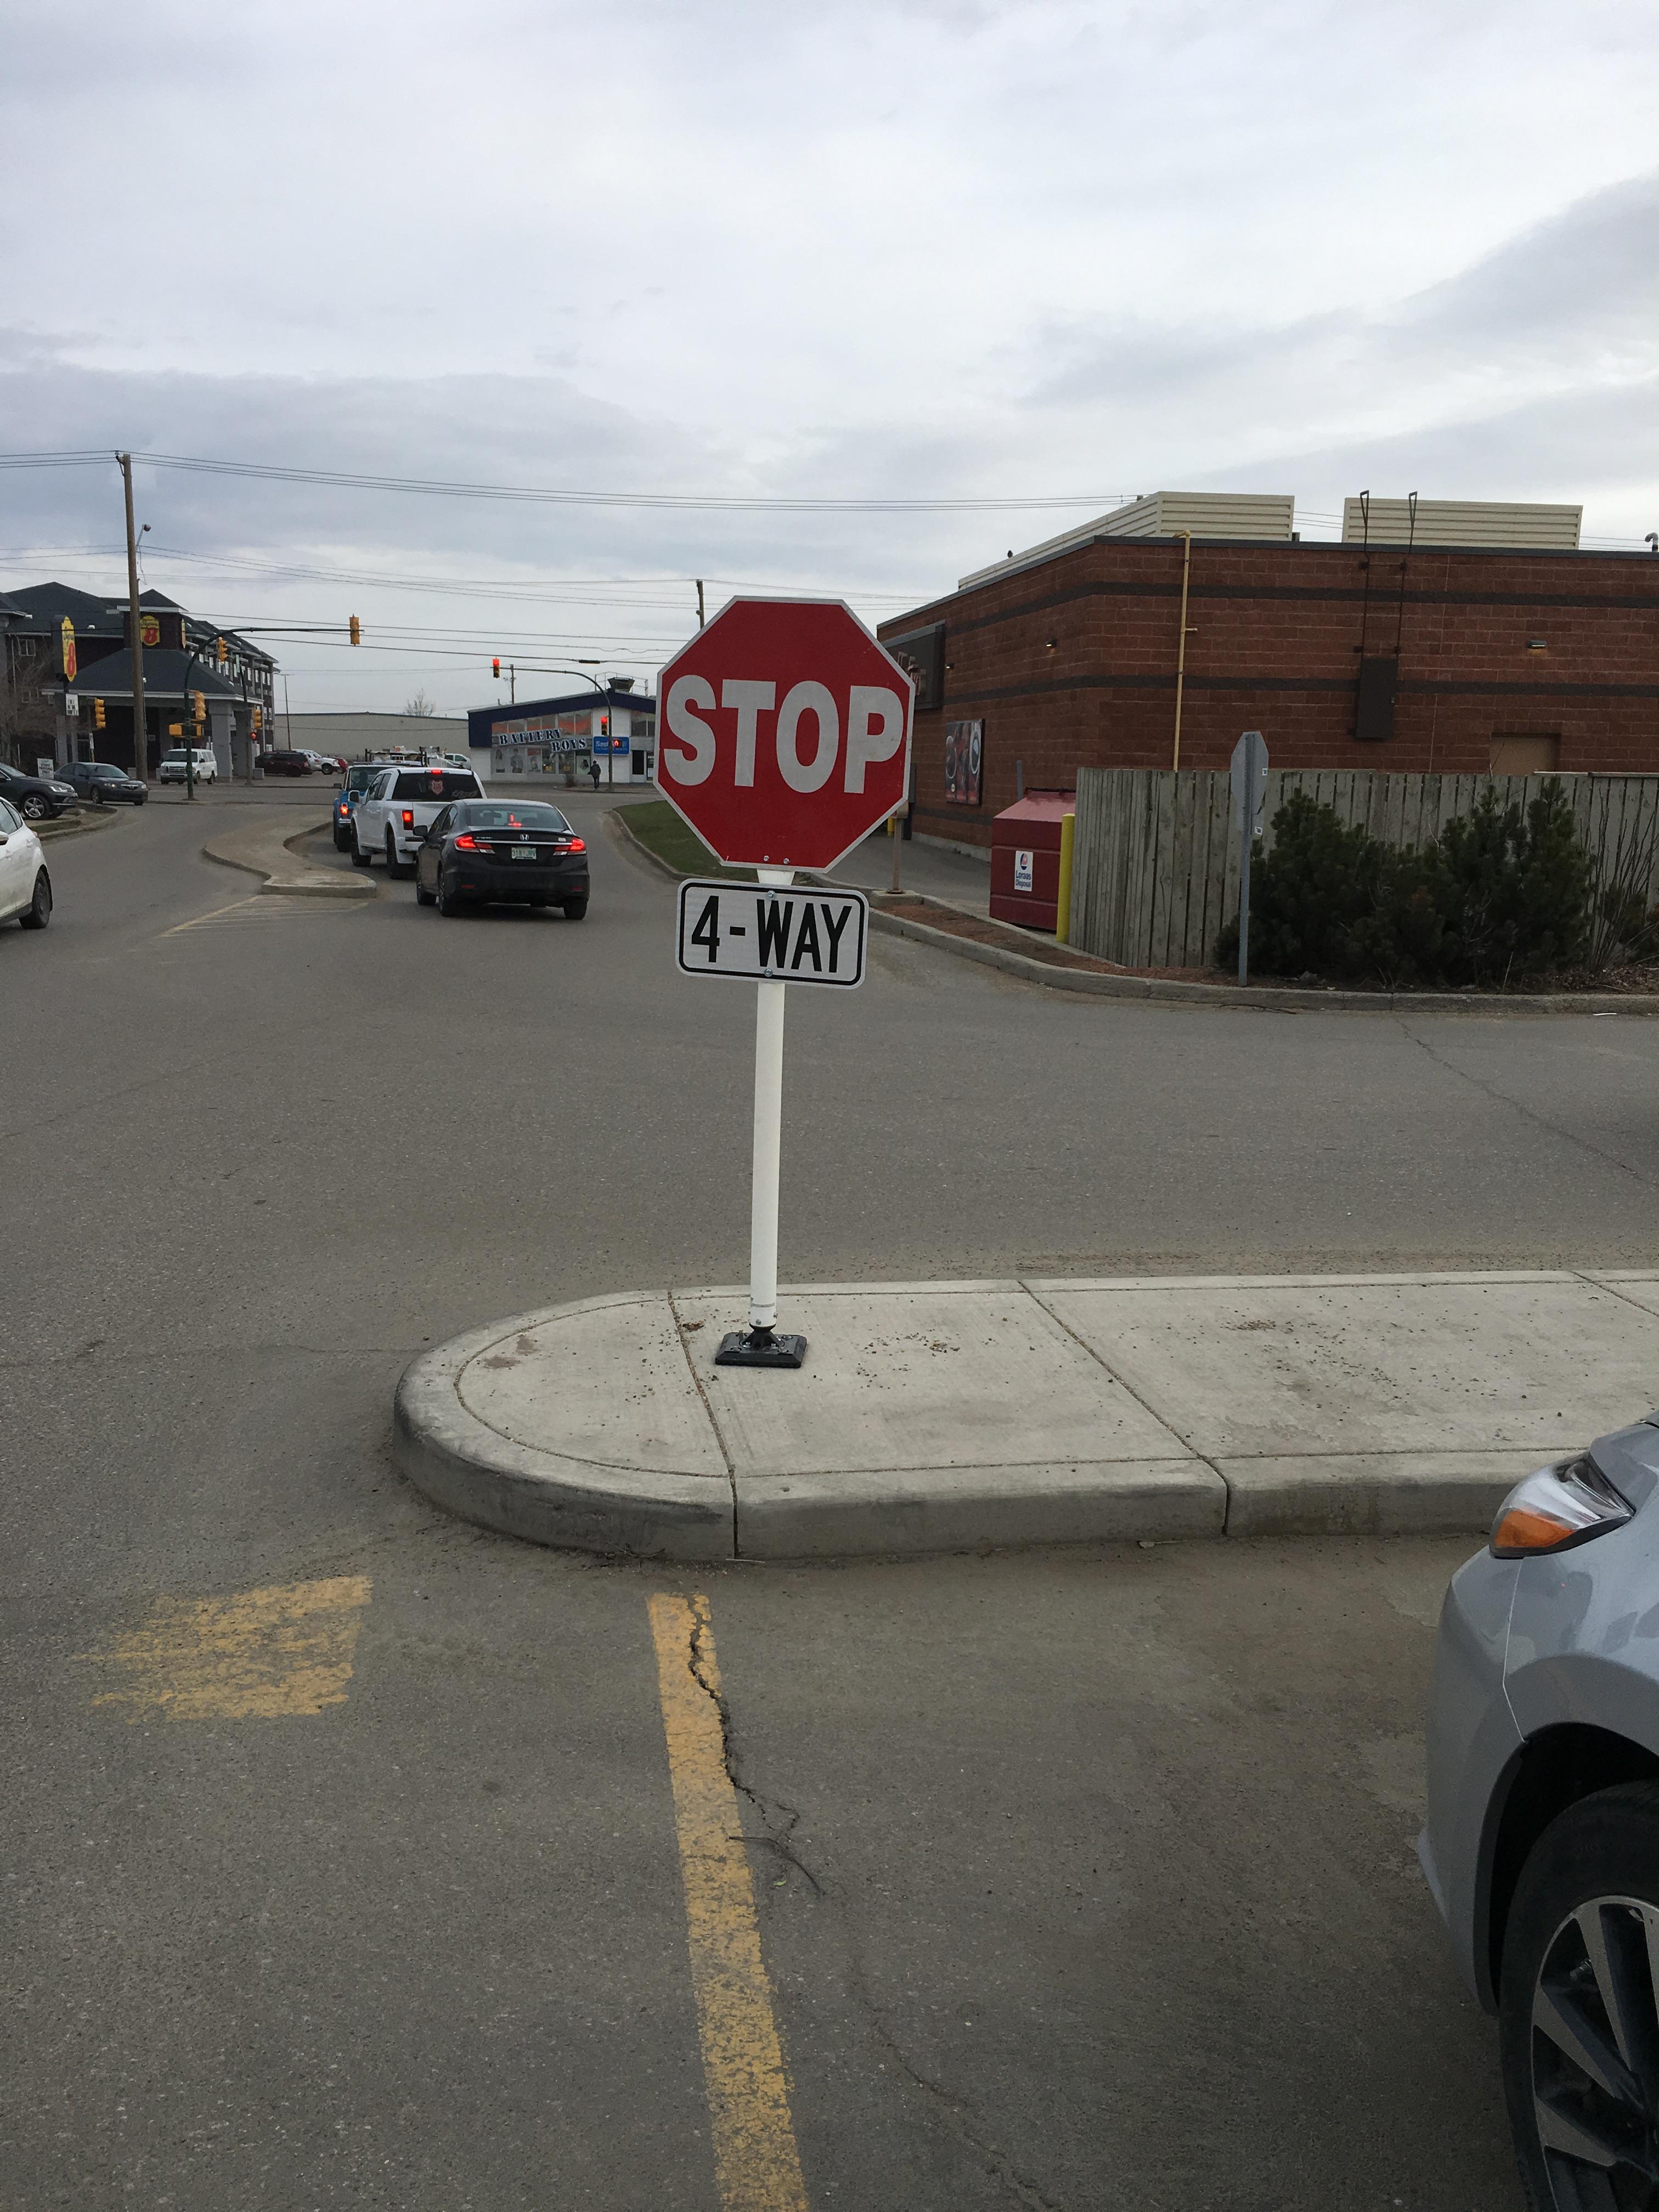 Parking Lot Stop Sign